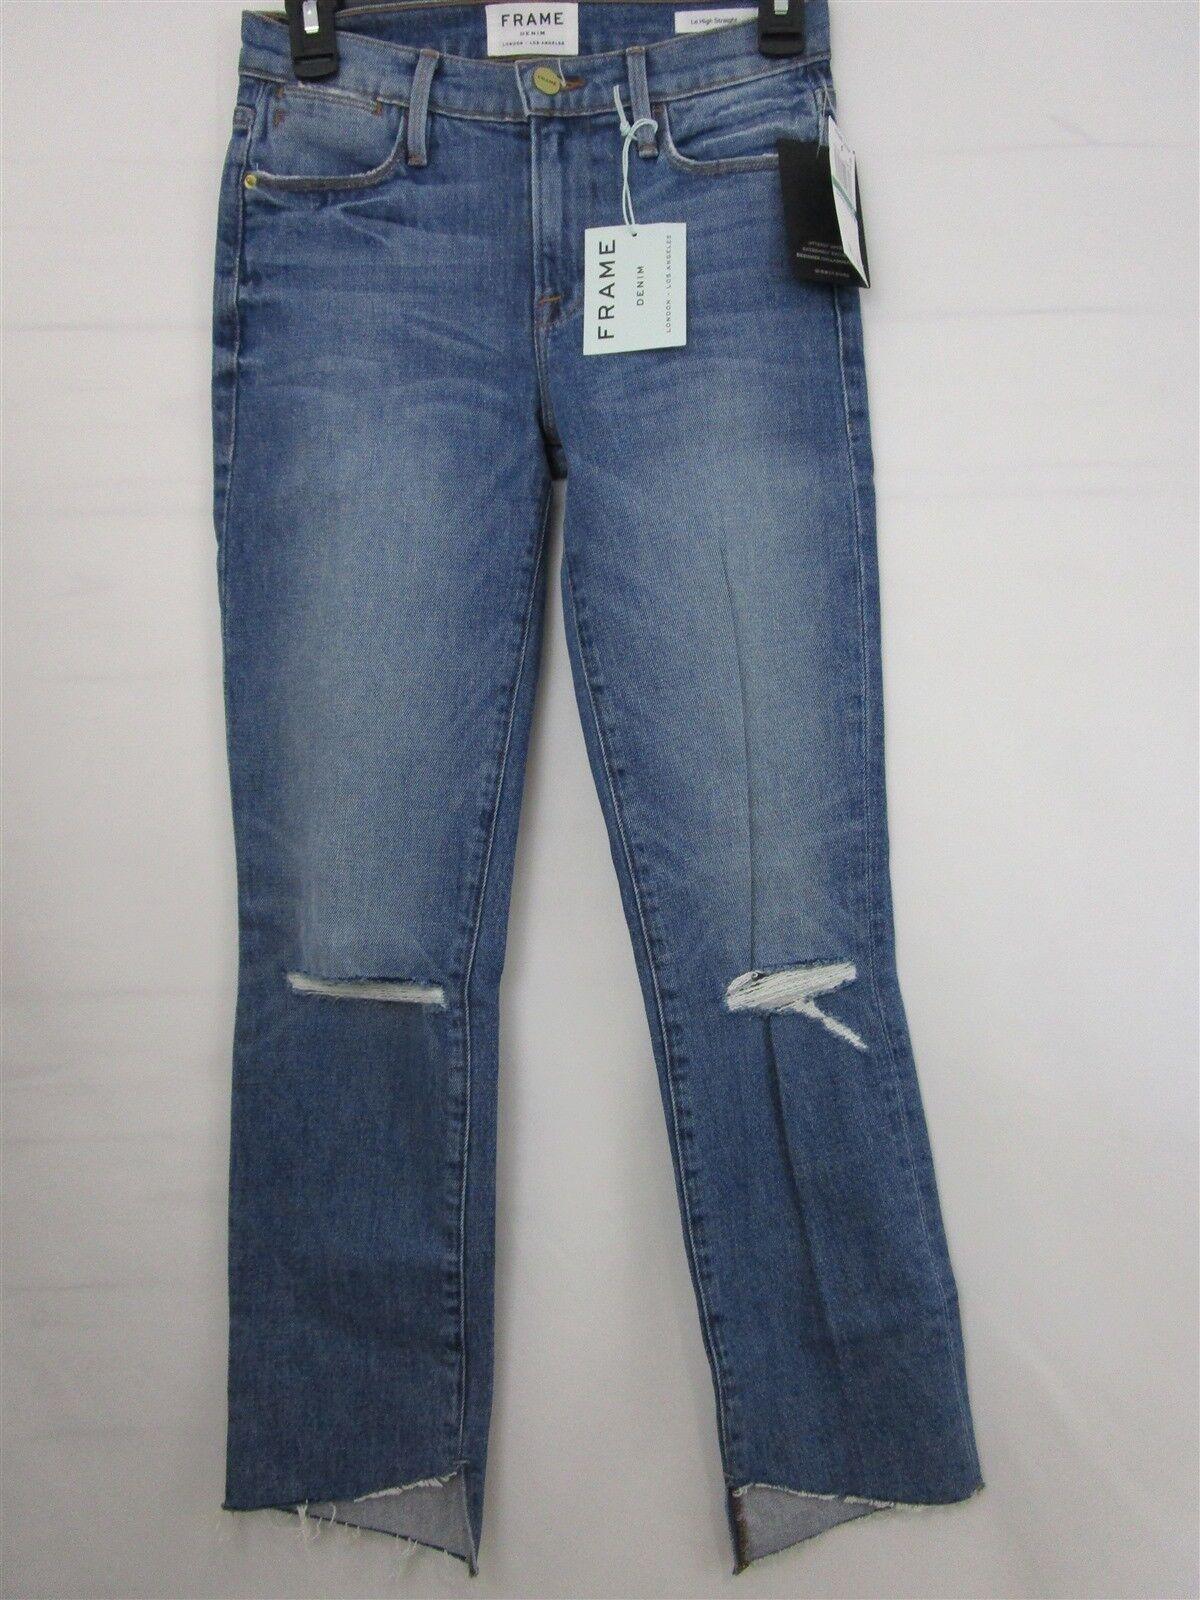 Frame Denim Femme Le High Straight Raw Edge Jeans Taille 24 0299 Neuf